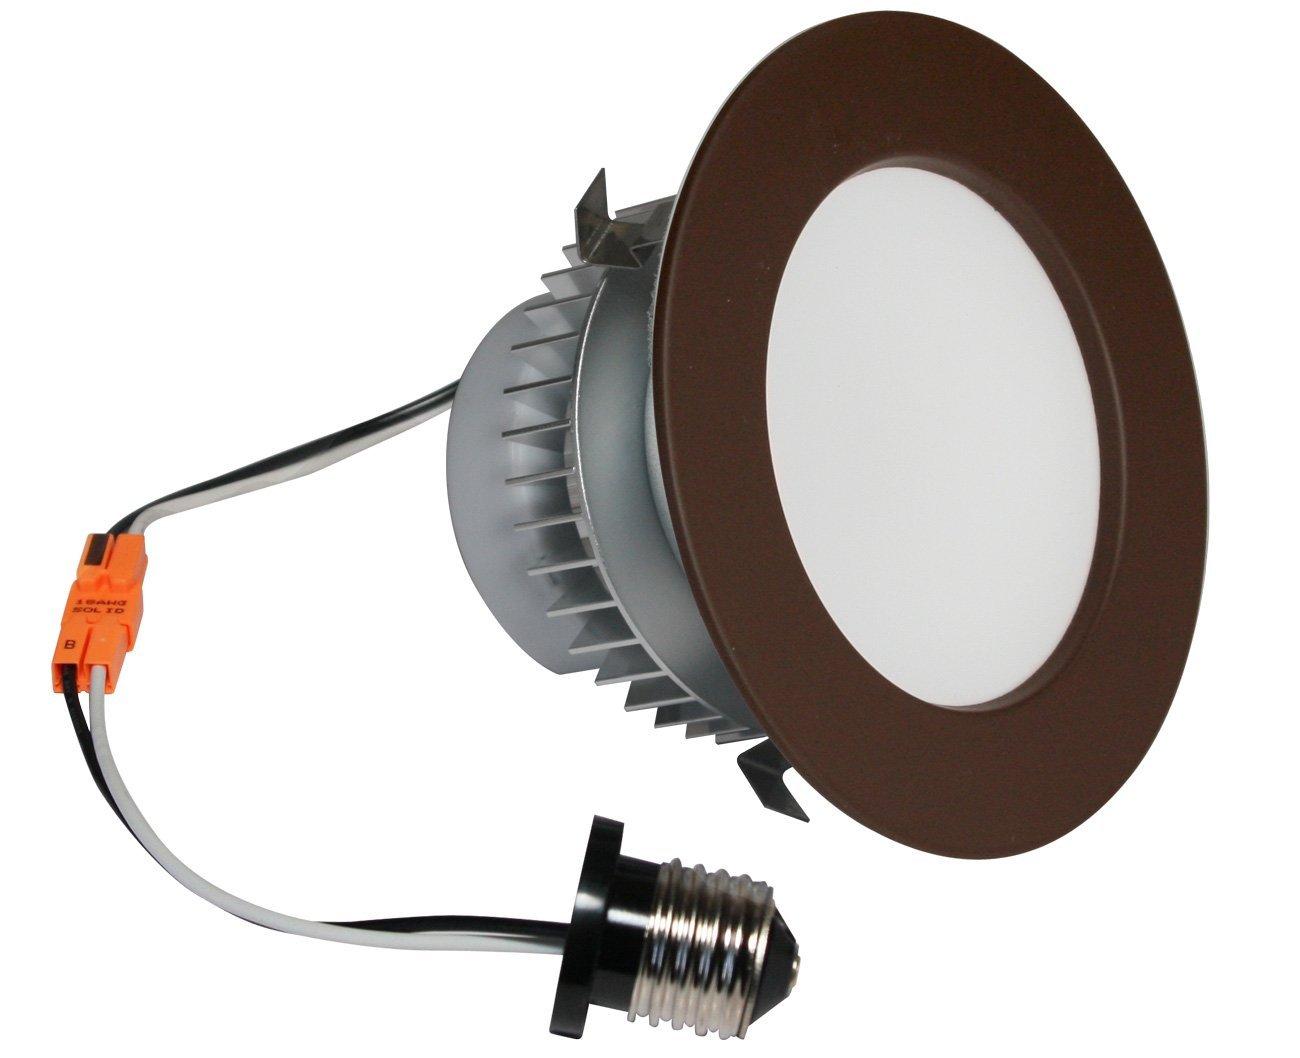 American Lighting EP4-E26-27-DB Samsung LED E-Pro Series Recessed Downlight, Dimmable, 7.6-Watts, 480 Lumens, 2700K Warm White, 4-Inch, Dark Bronze